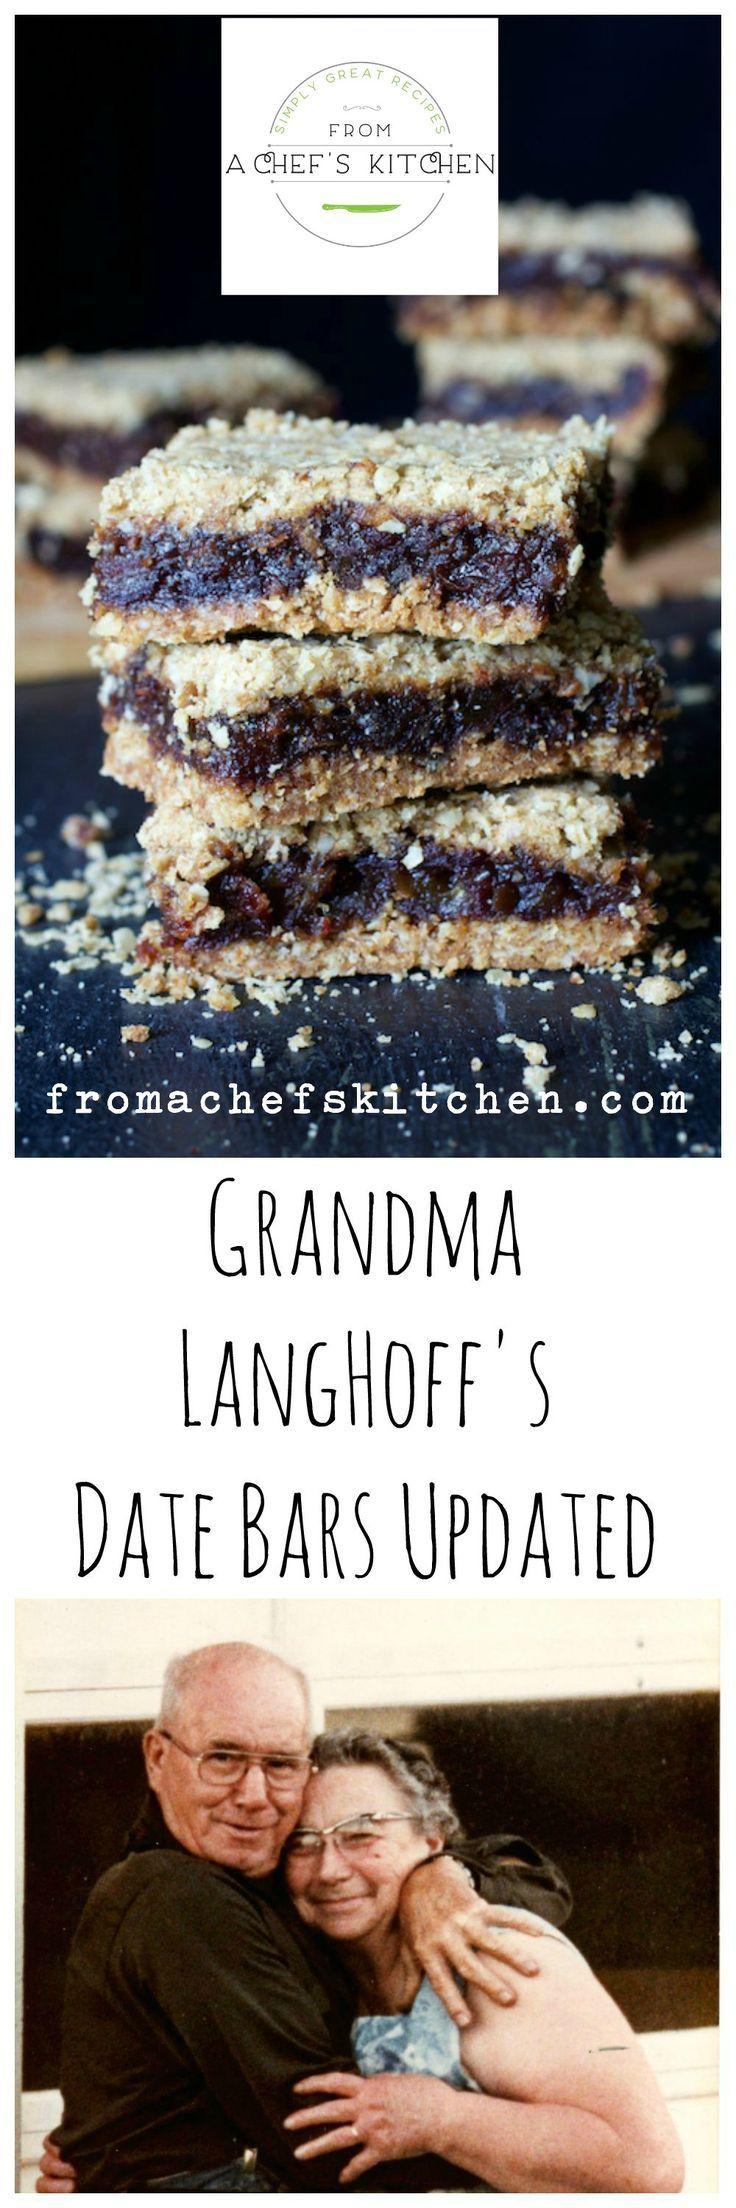 Grandma Langhoff's Date Bars Updated